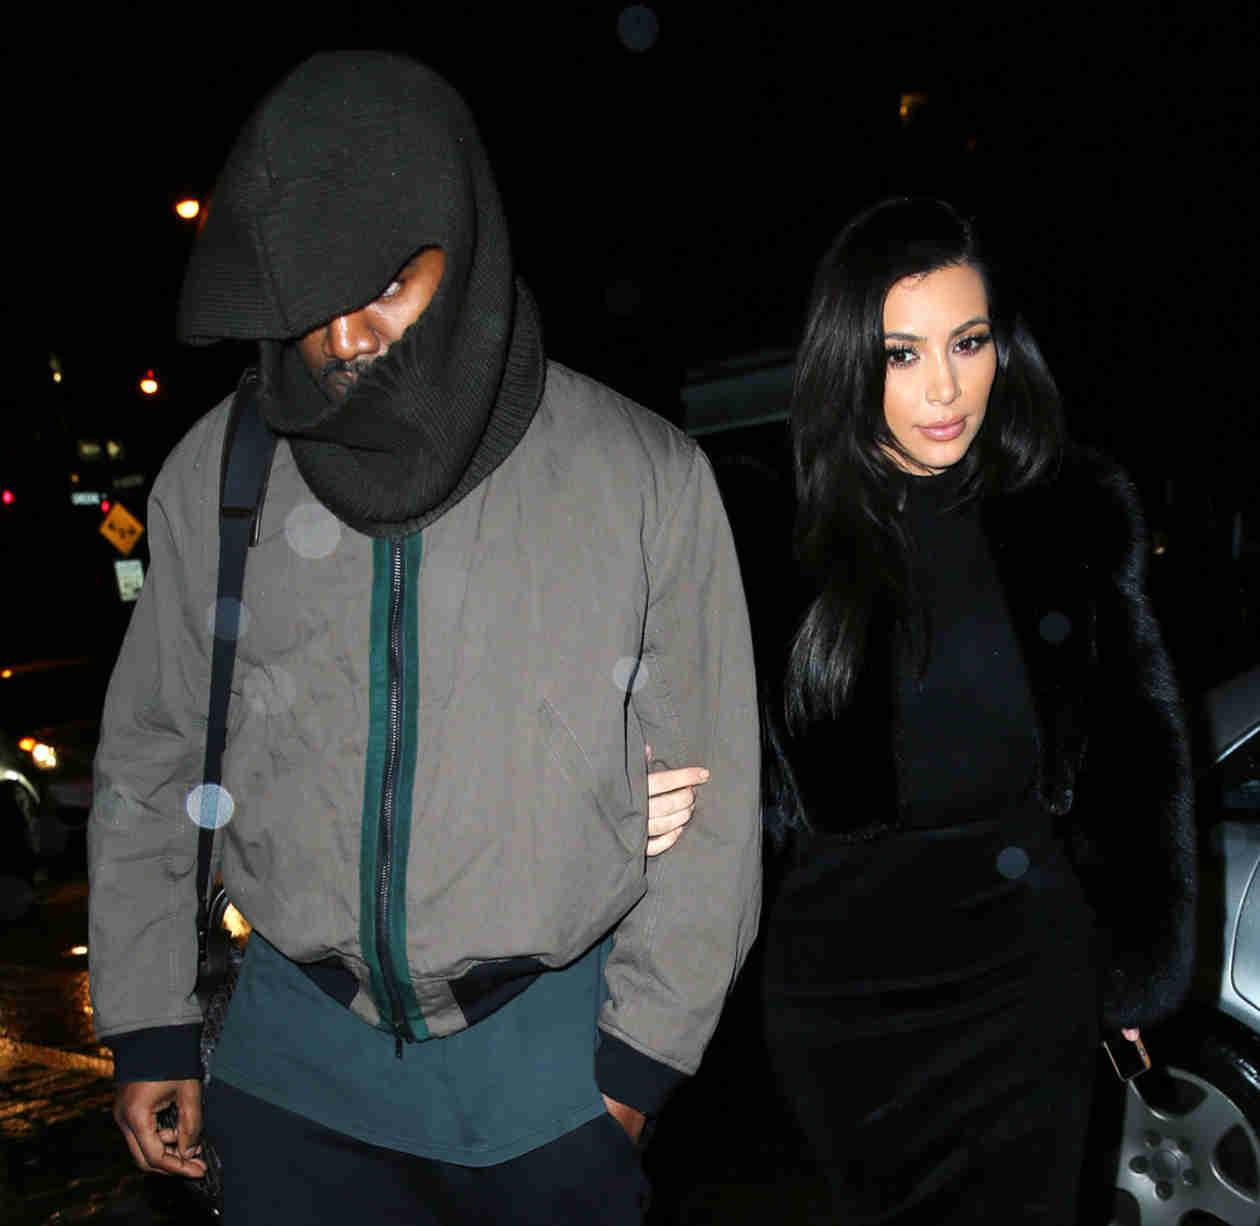 Did Kim Kardashian Dye Her Hair Even Darker? See Her Black 'Do (PHOTOS)